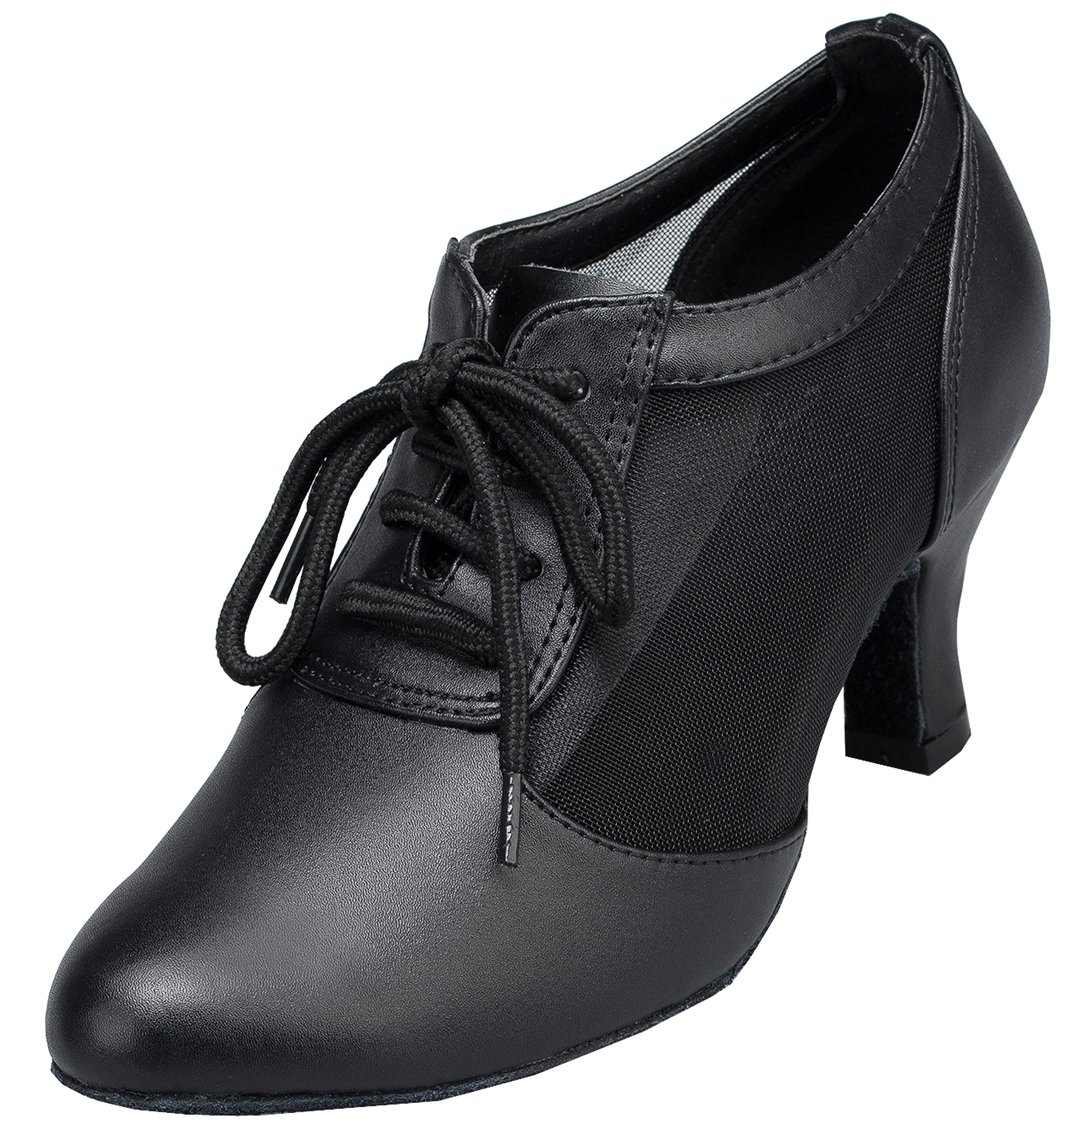 TDA Womens Fashion Lace-up Black Leather Mesh Mid Heel Latin Modern Salsa Tango Ballroom Wedding Dance Shoes 7 M US